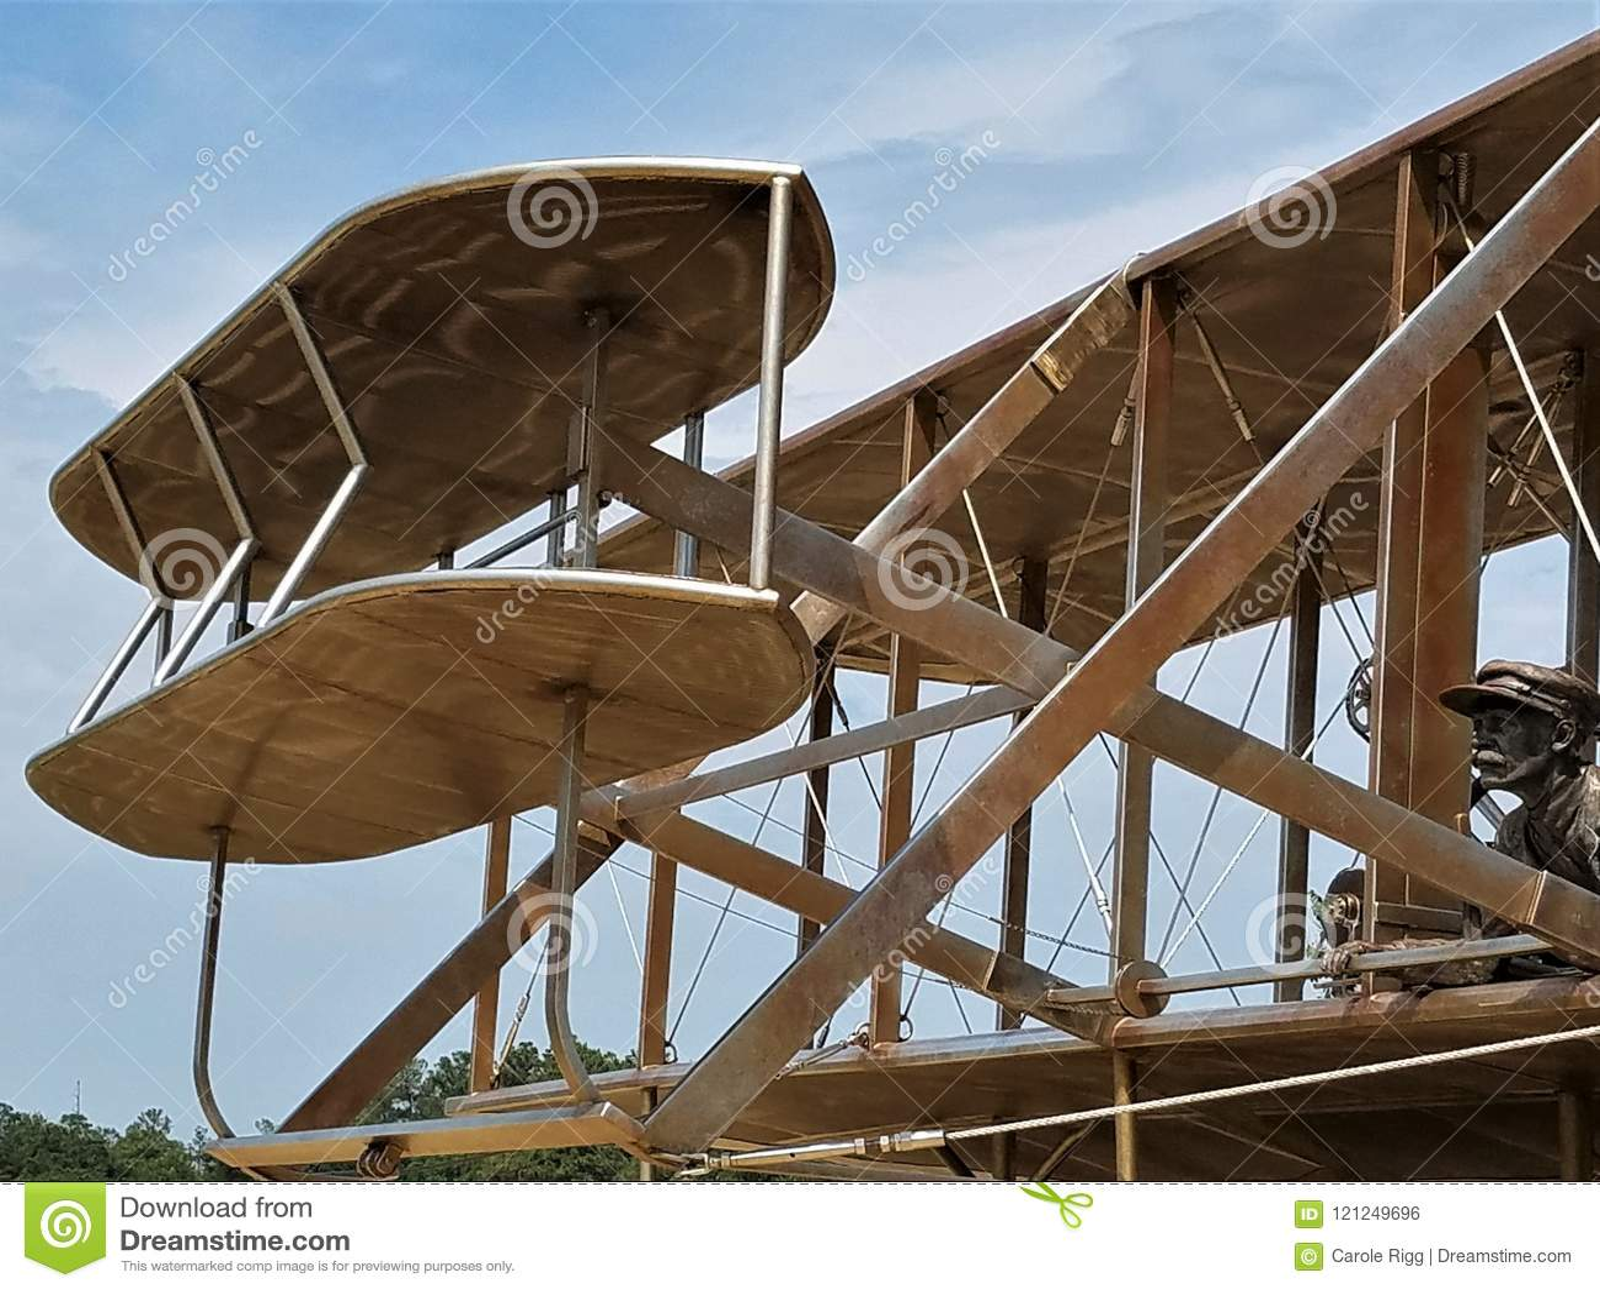 Wright Brothers Plane Replica